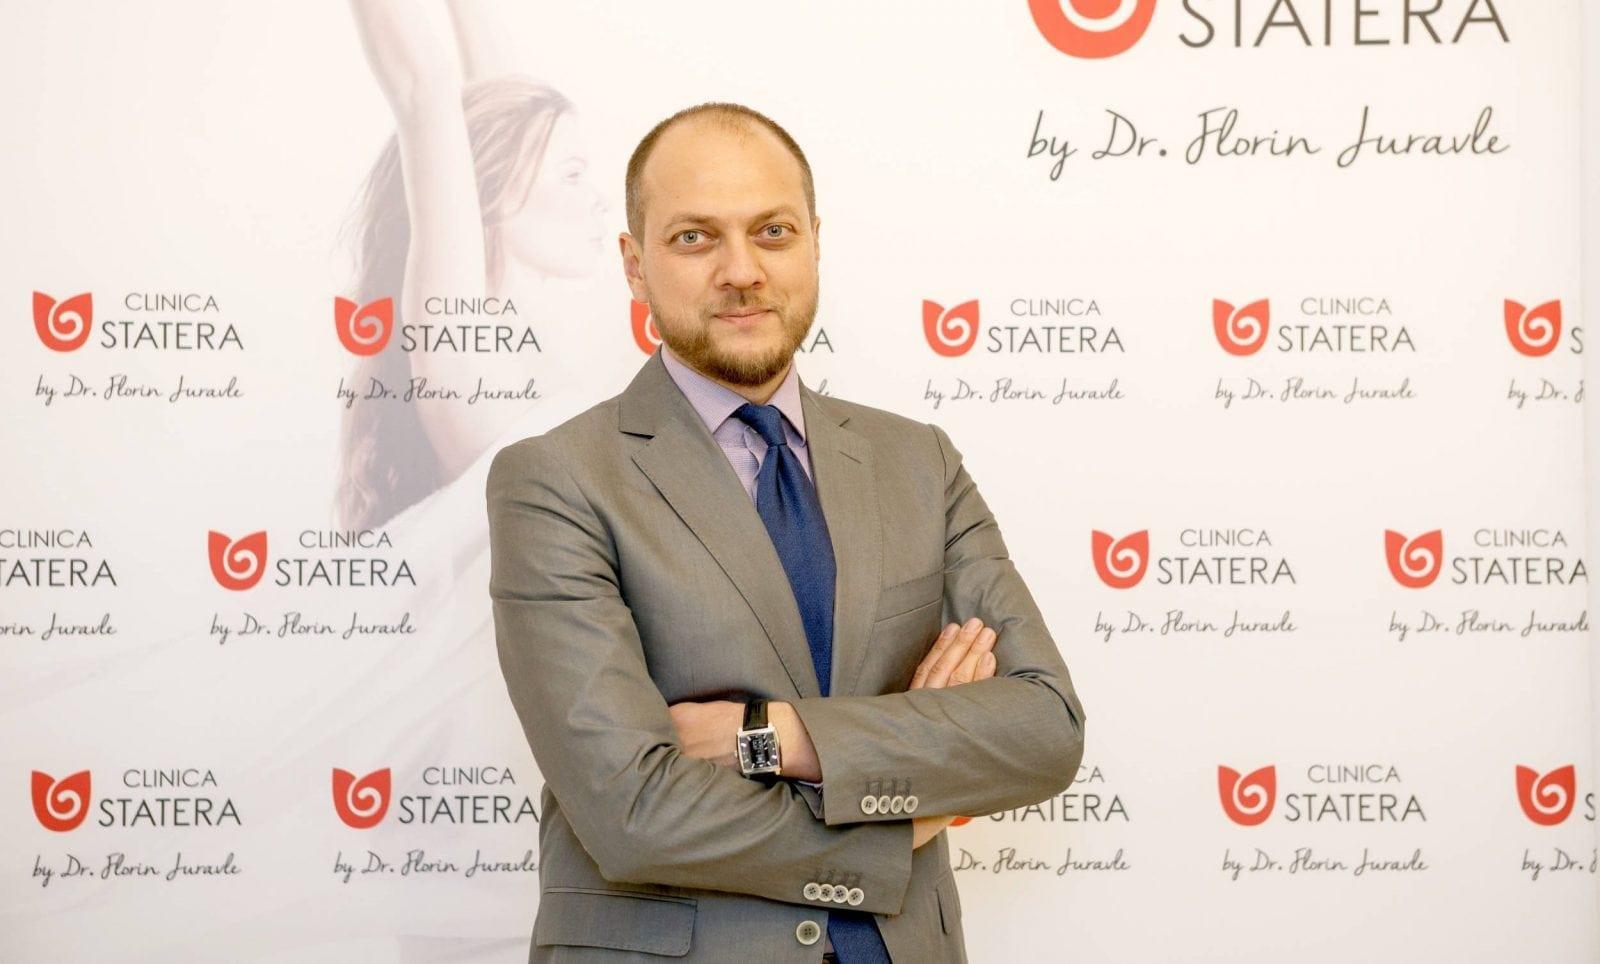 dr florin juravle 2 e1475757245162 - Clinica STATERA, inovația medicului chirurg estetician Dr. Florin Juravle